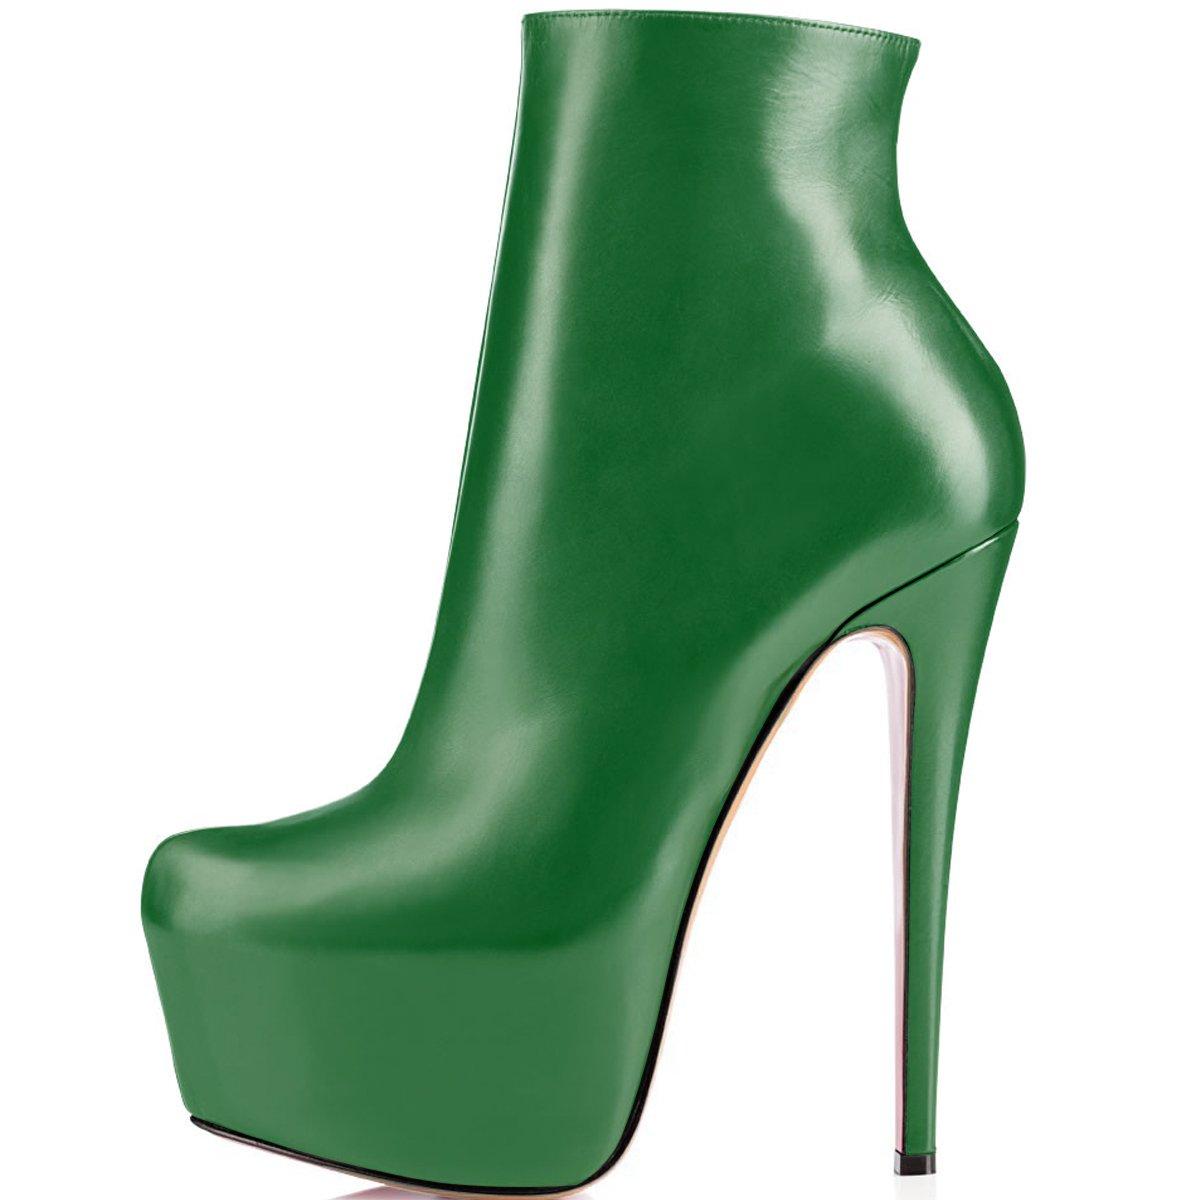 ELASHE Ankle Boots | 15cmTrendige Damen Stiefeletten | Plateau Stiefel mit Absatz36 EU|Gr眉n